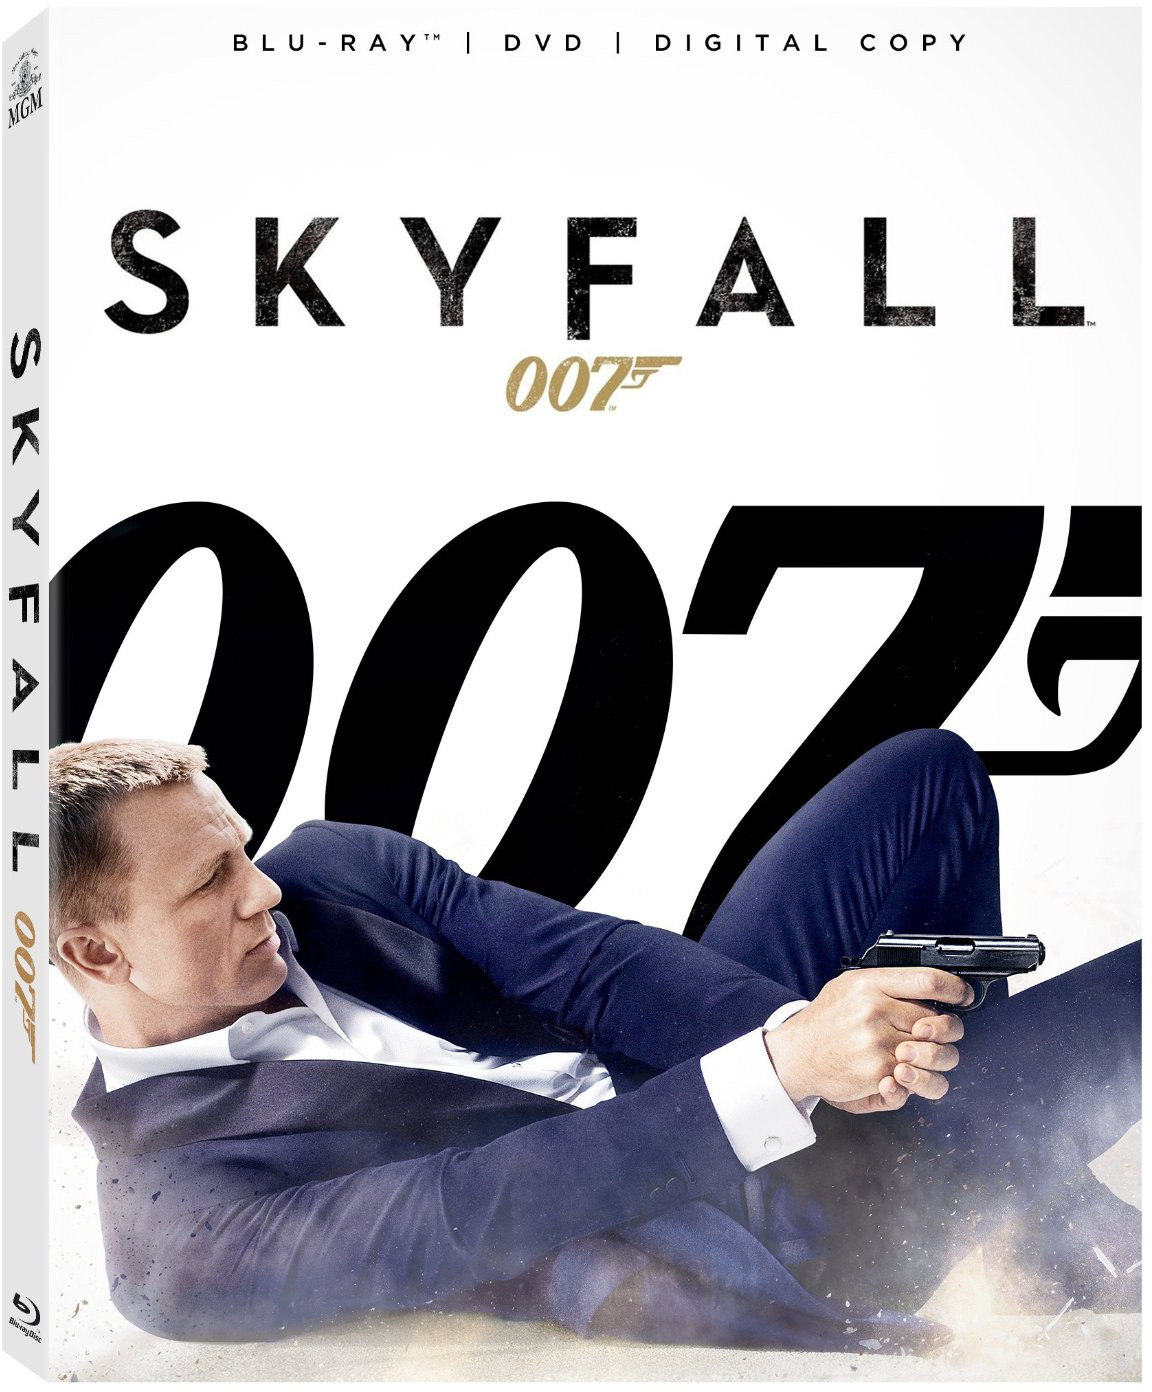 Skyfall on Blu-Ray and DVD